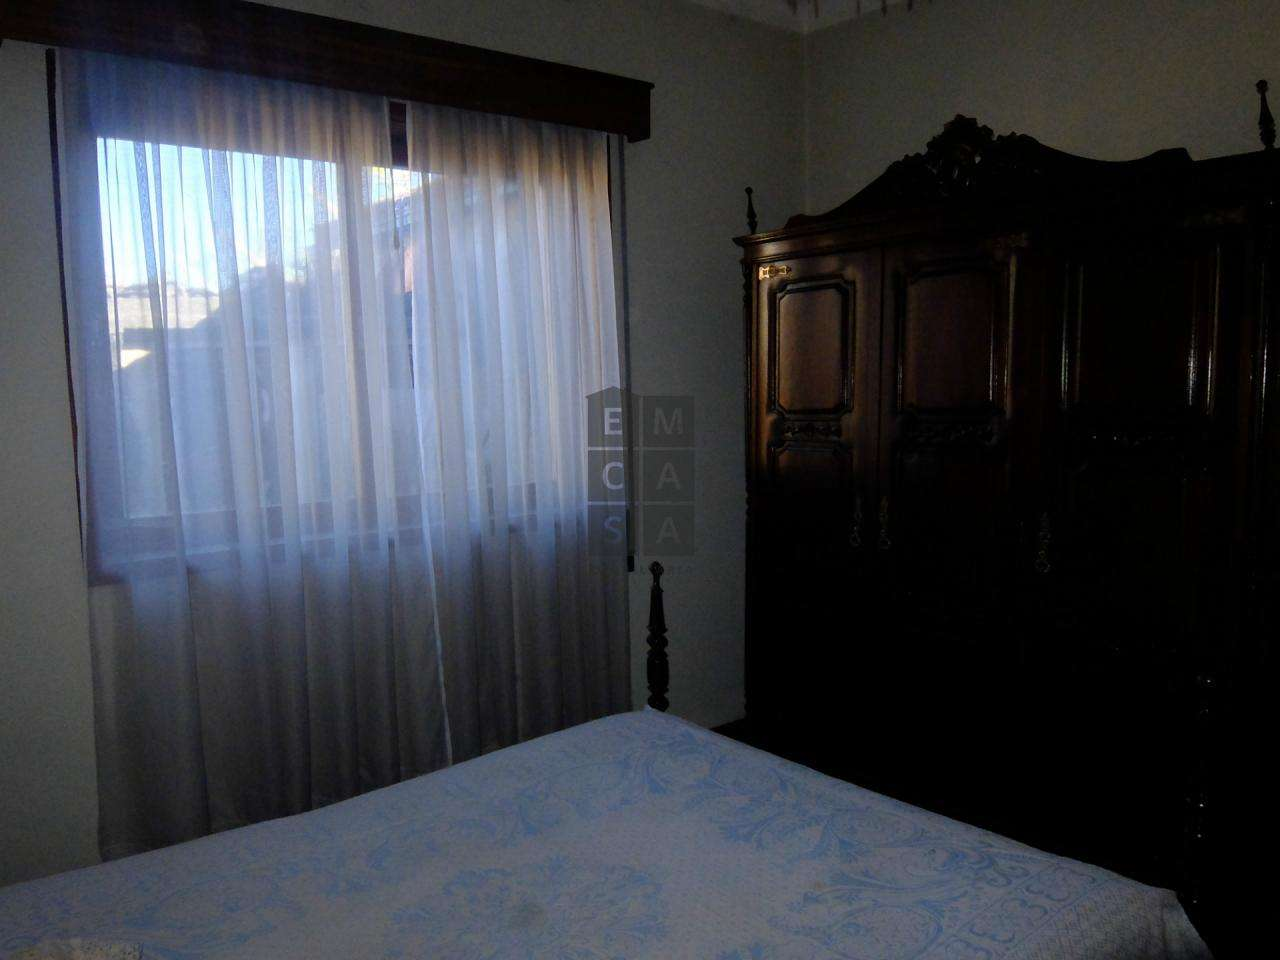 Moradia para comprar, Oliveira de Azeméis, Santiago de Riba-Ul, Ul, Macinhata da Seixa e Madail, Oliveira de Azeméis, Aveiro - Foto 11